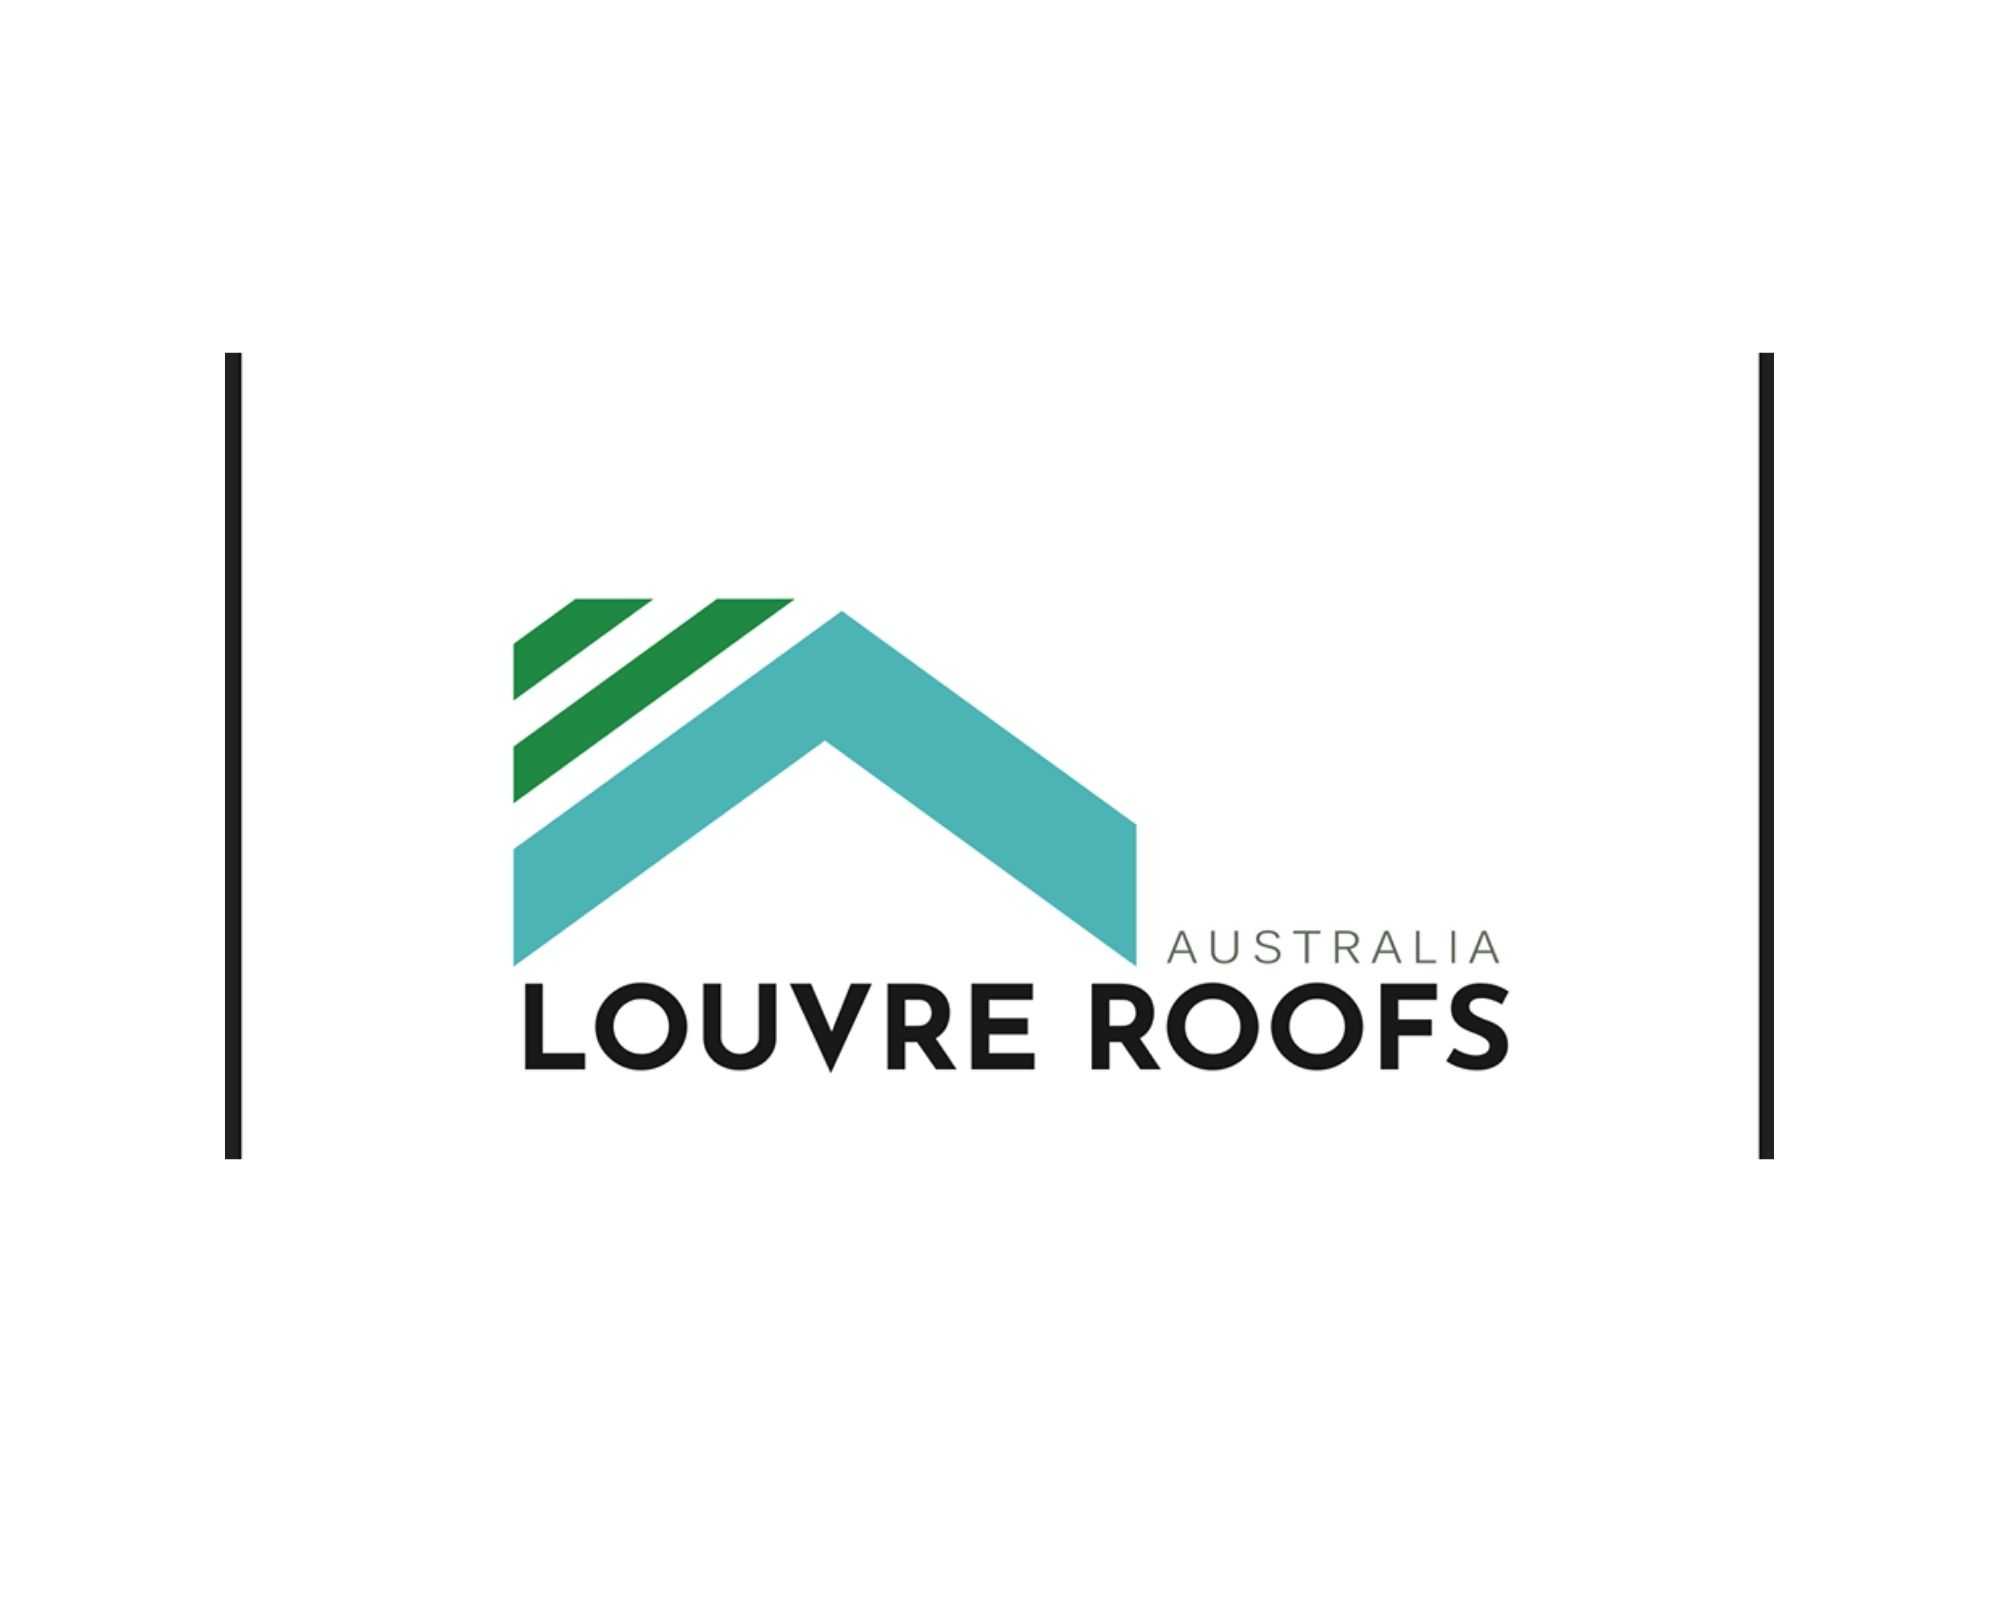 Louvre Roofs Australia